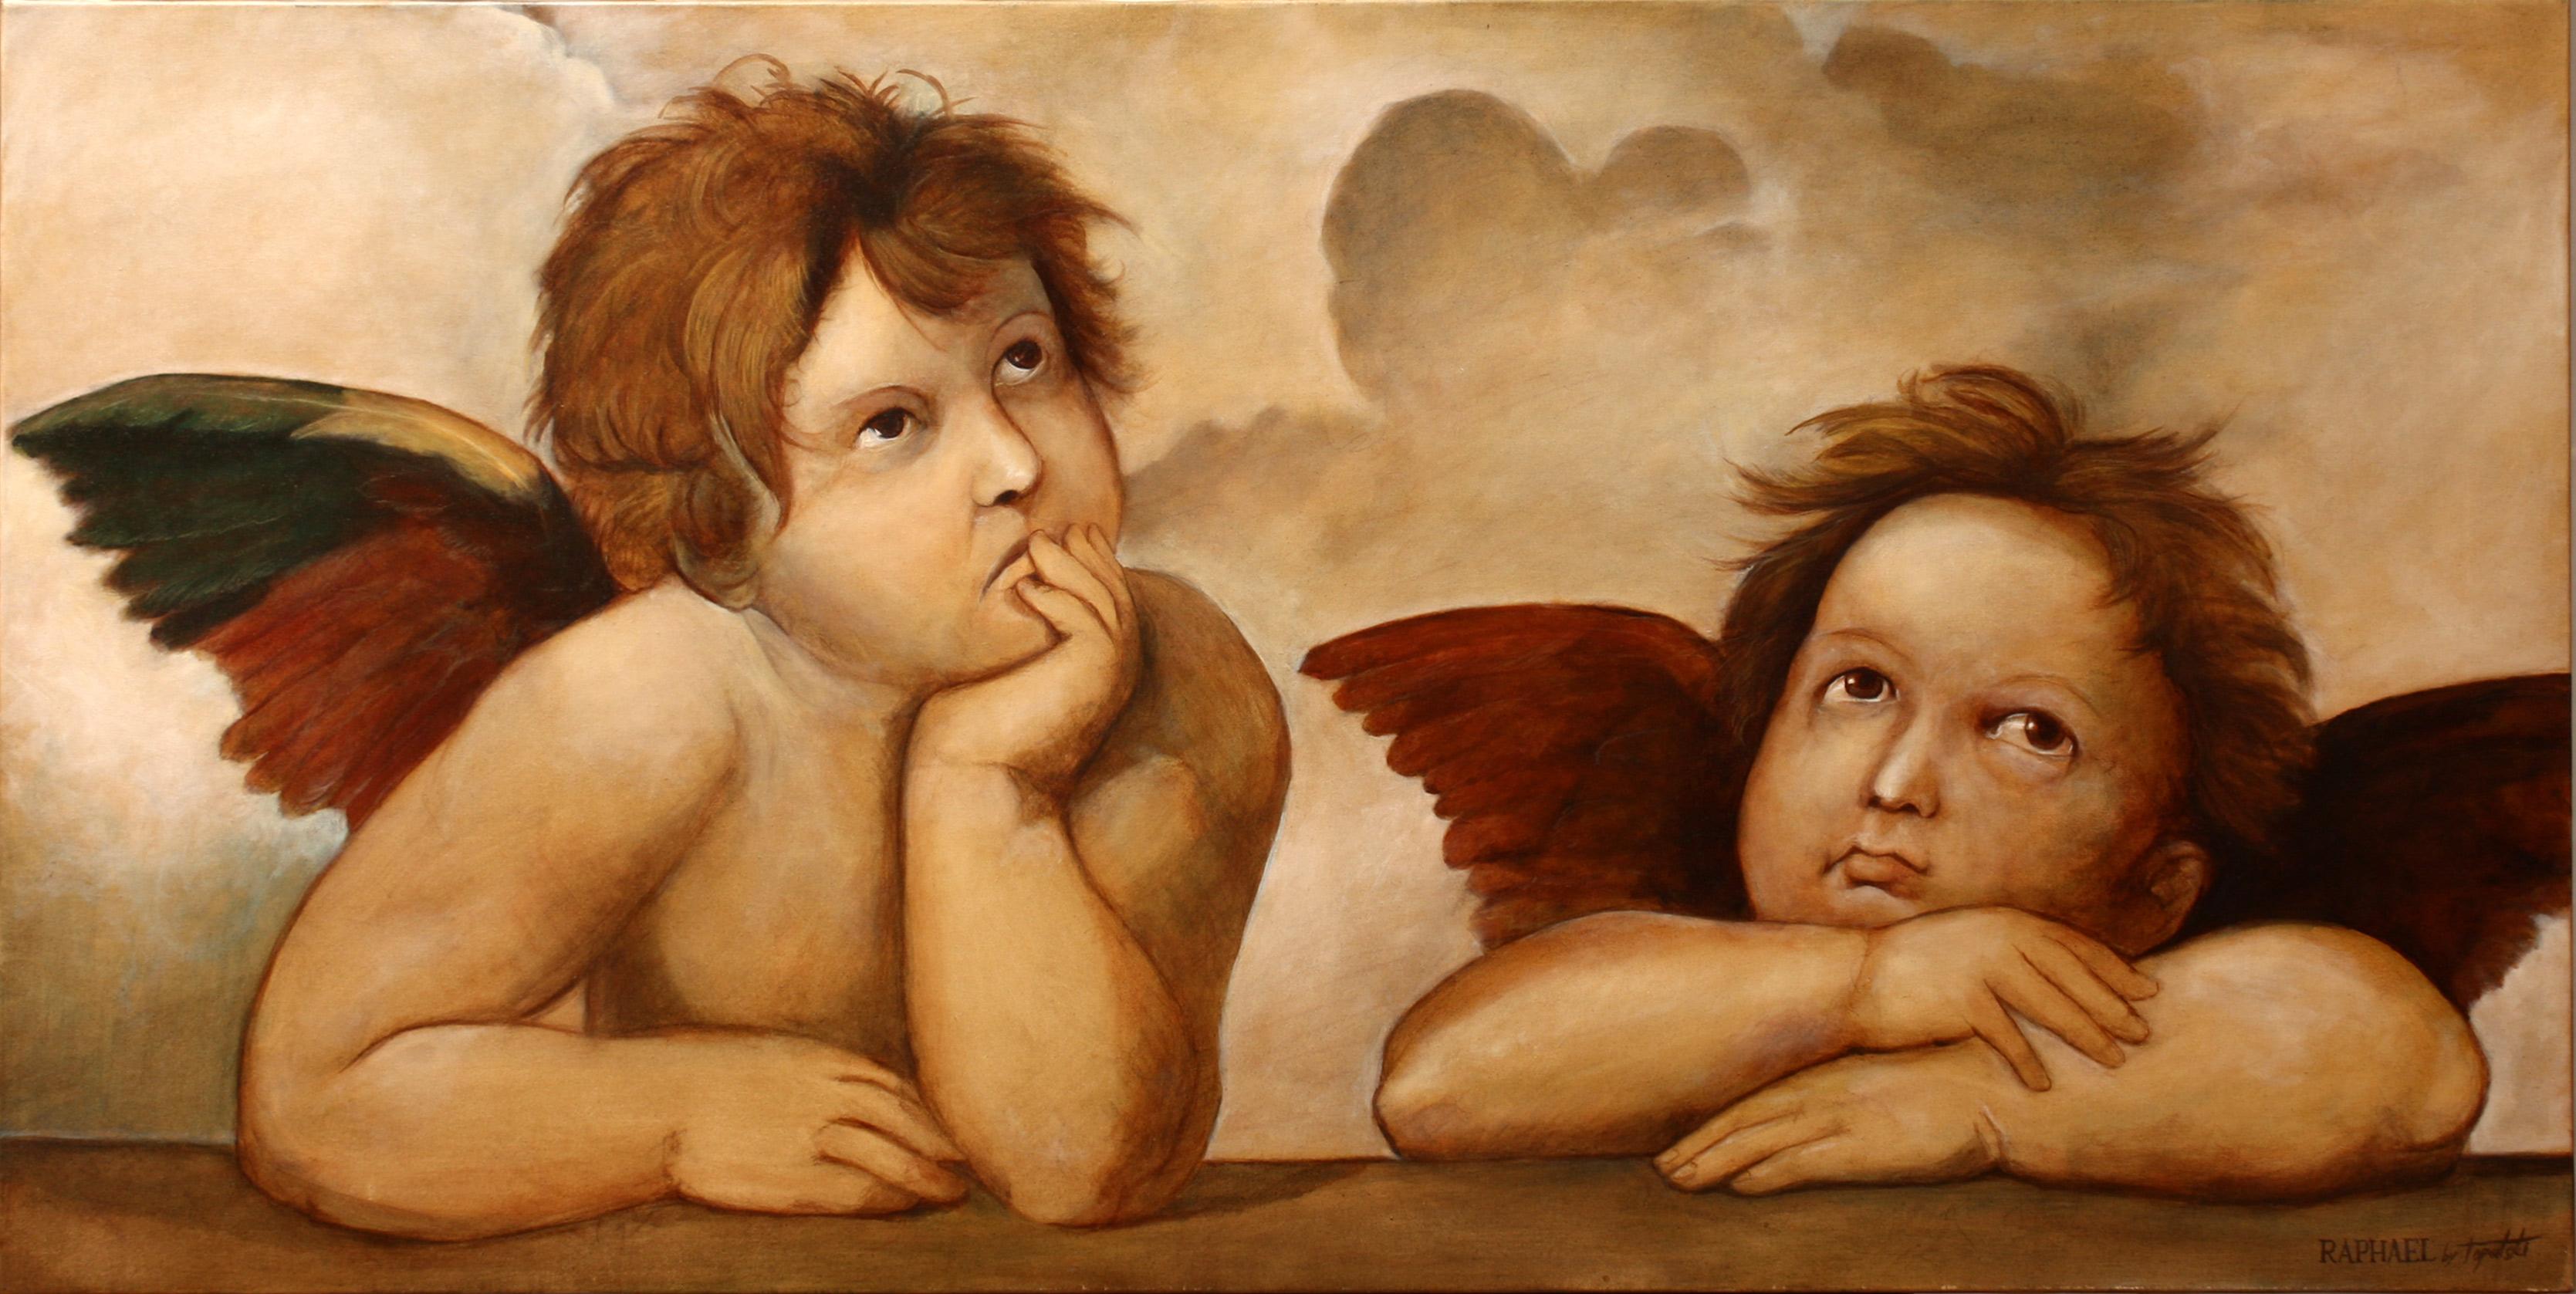 Angel raphael story